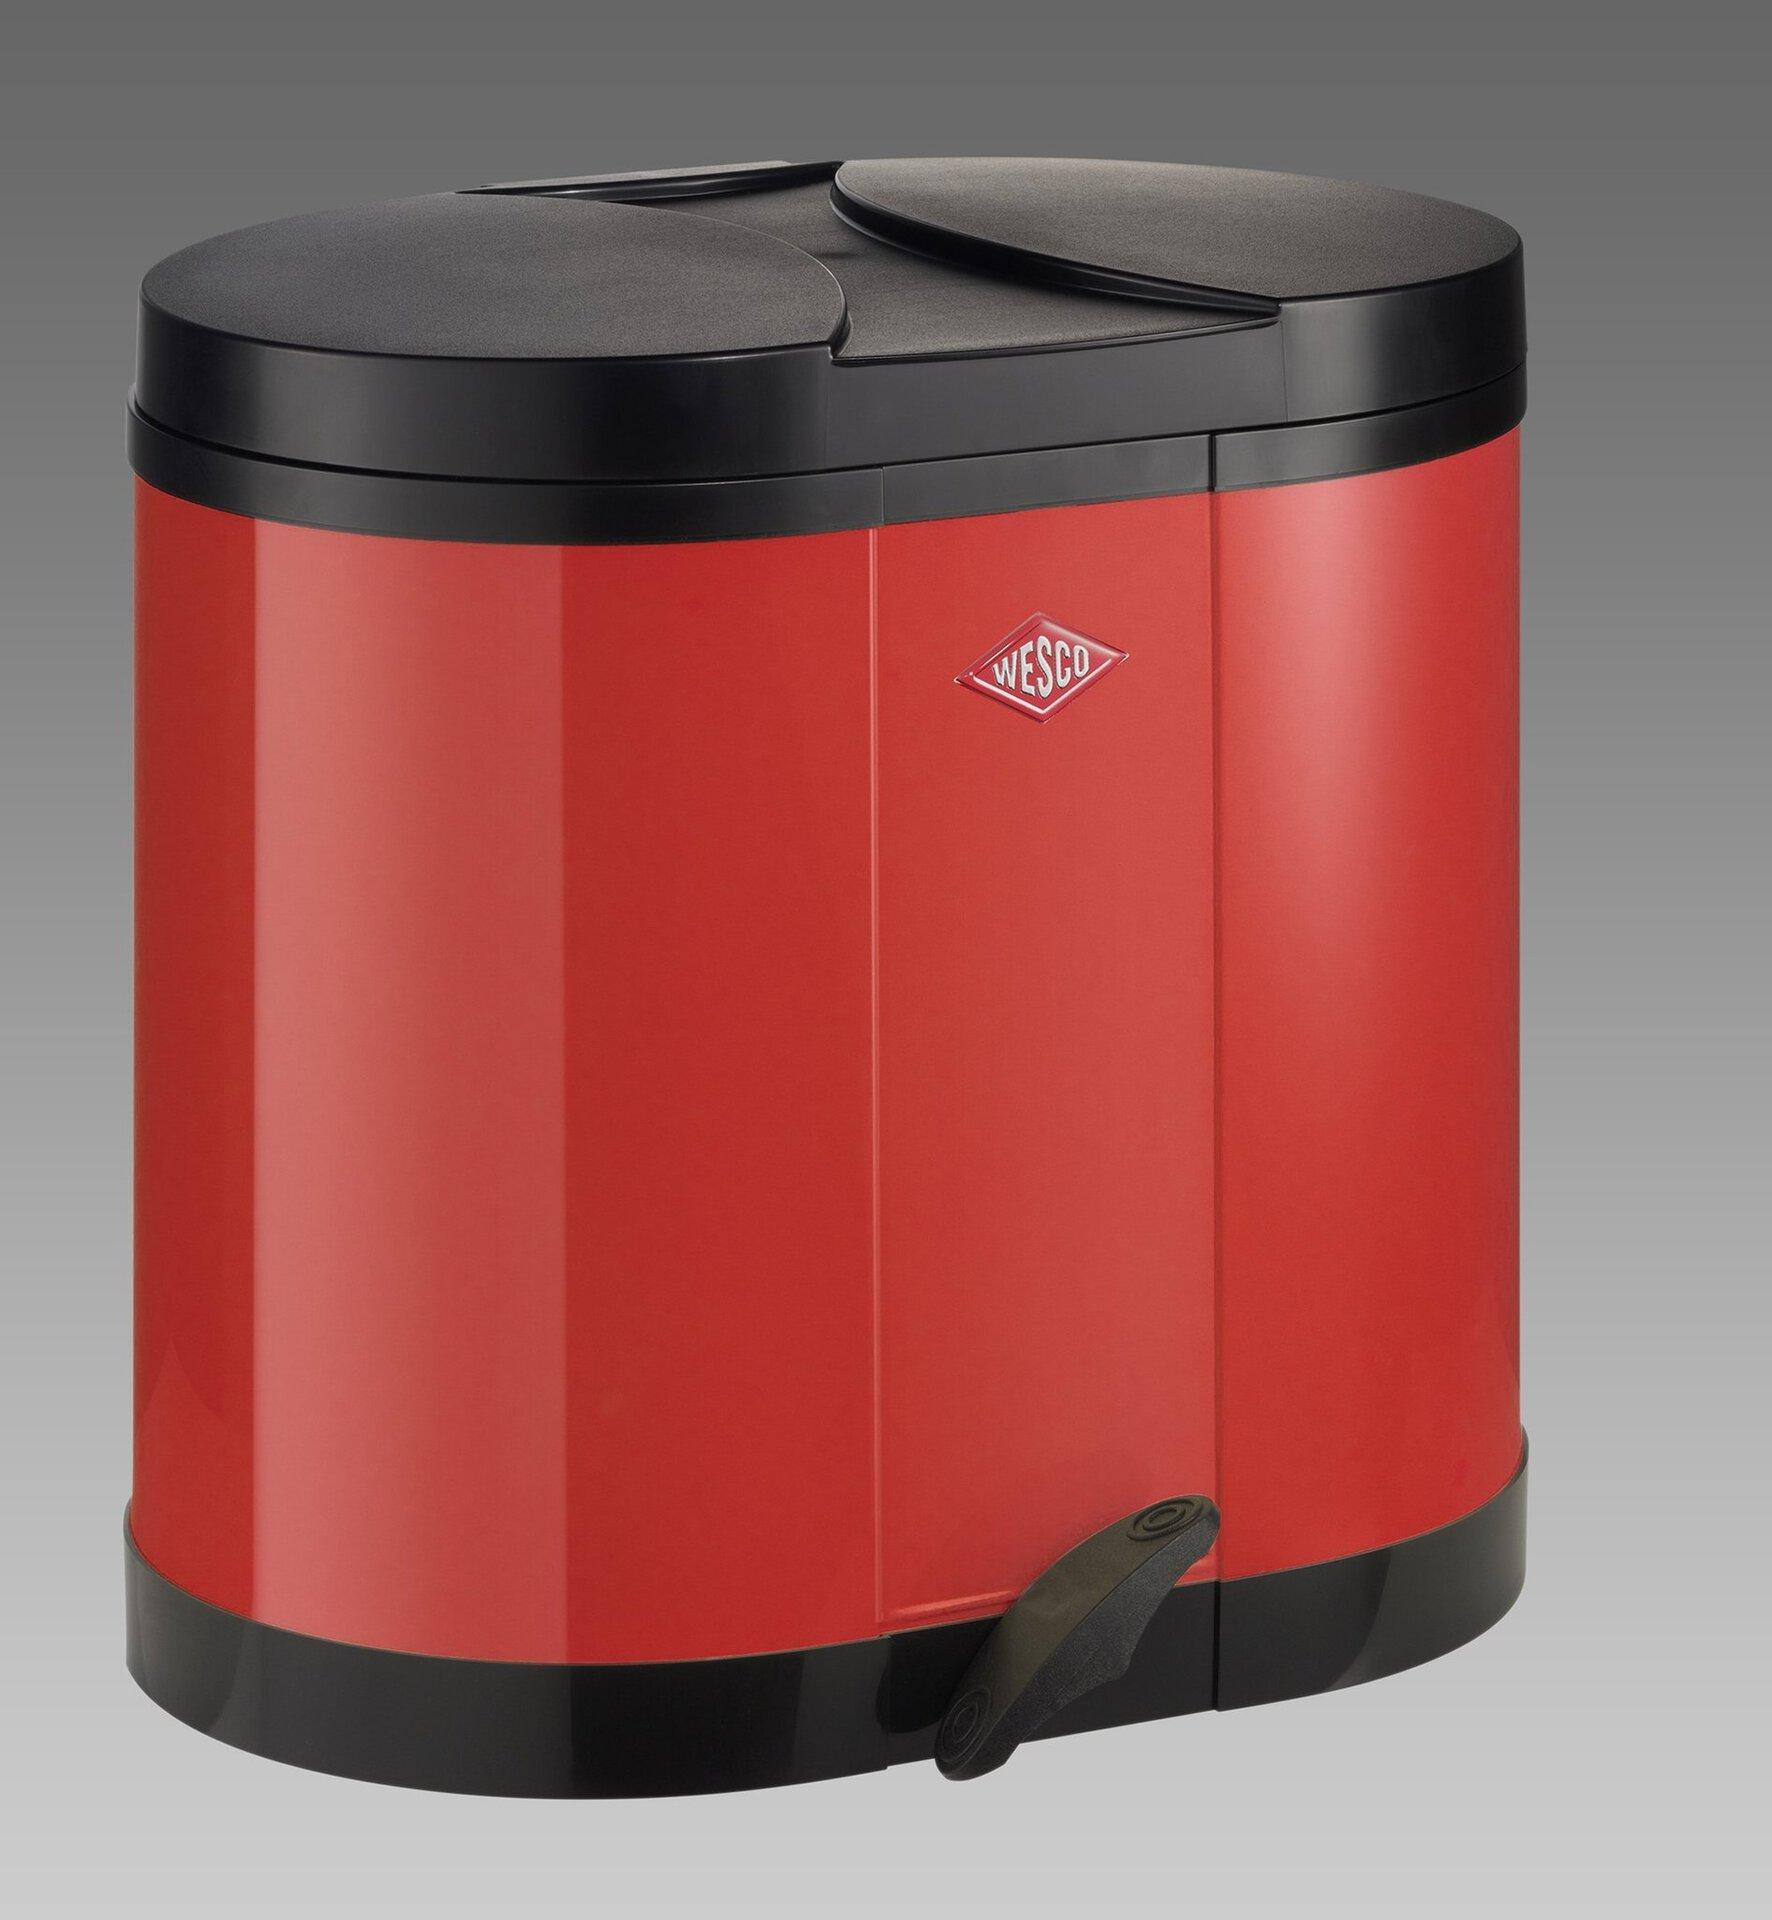 Müllbehälter Wesco Metall